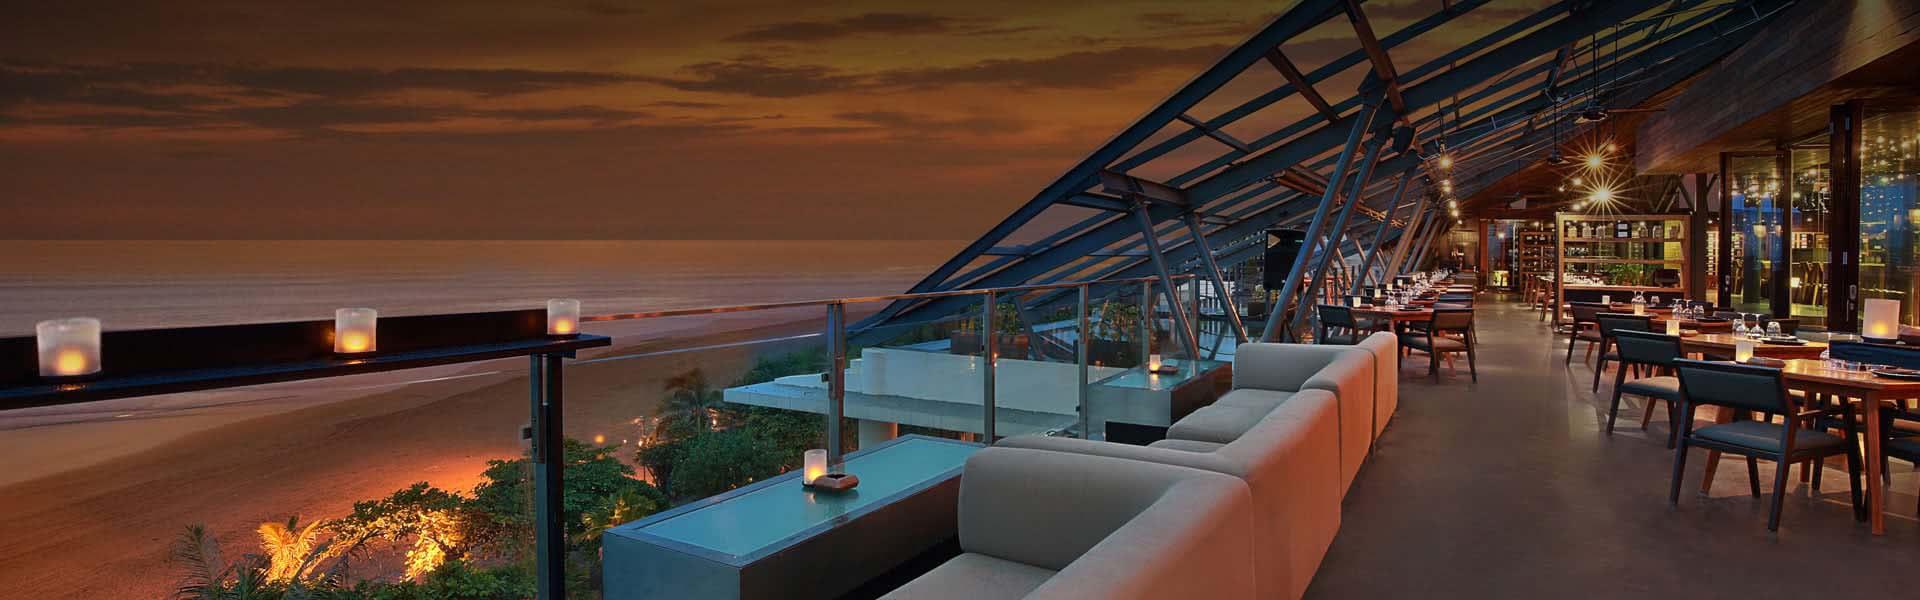 Seminyak Bali Restaurants Anantara Seminyak Moonlight